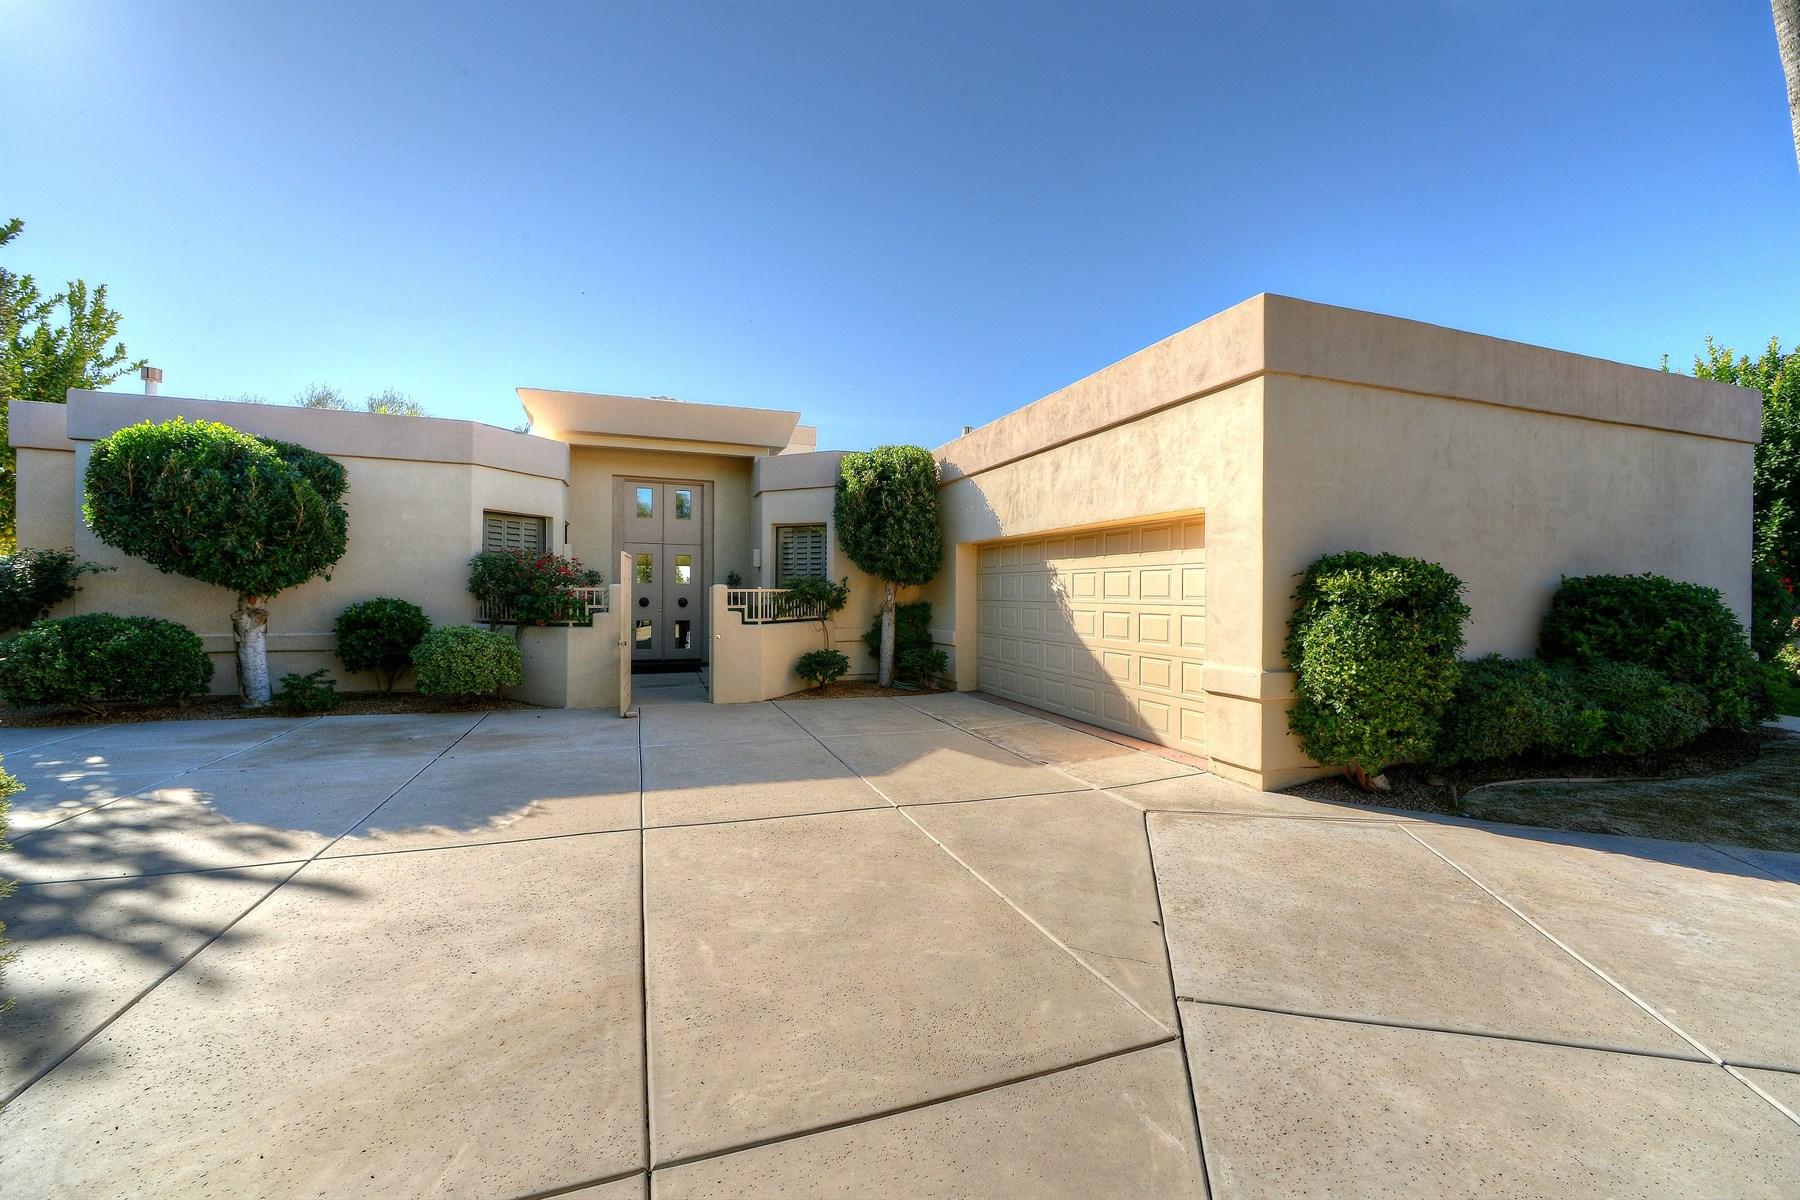 Tek Ailelik Ev için Satış at Coveted lakeside property located in prestigious Scottsdale Ranch 10295 E Cochise Dr Scottsdale, Arizona 85258 Amerika Birleşik Devletleri